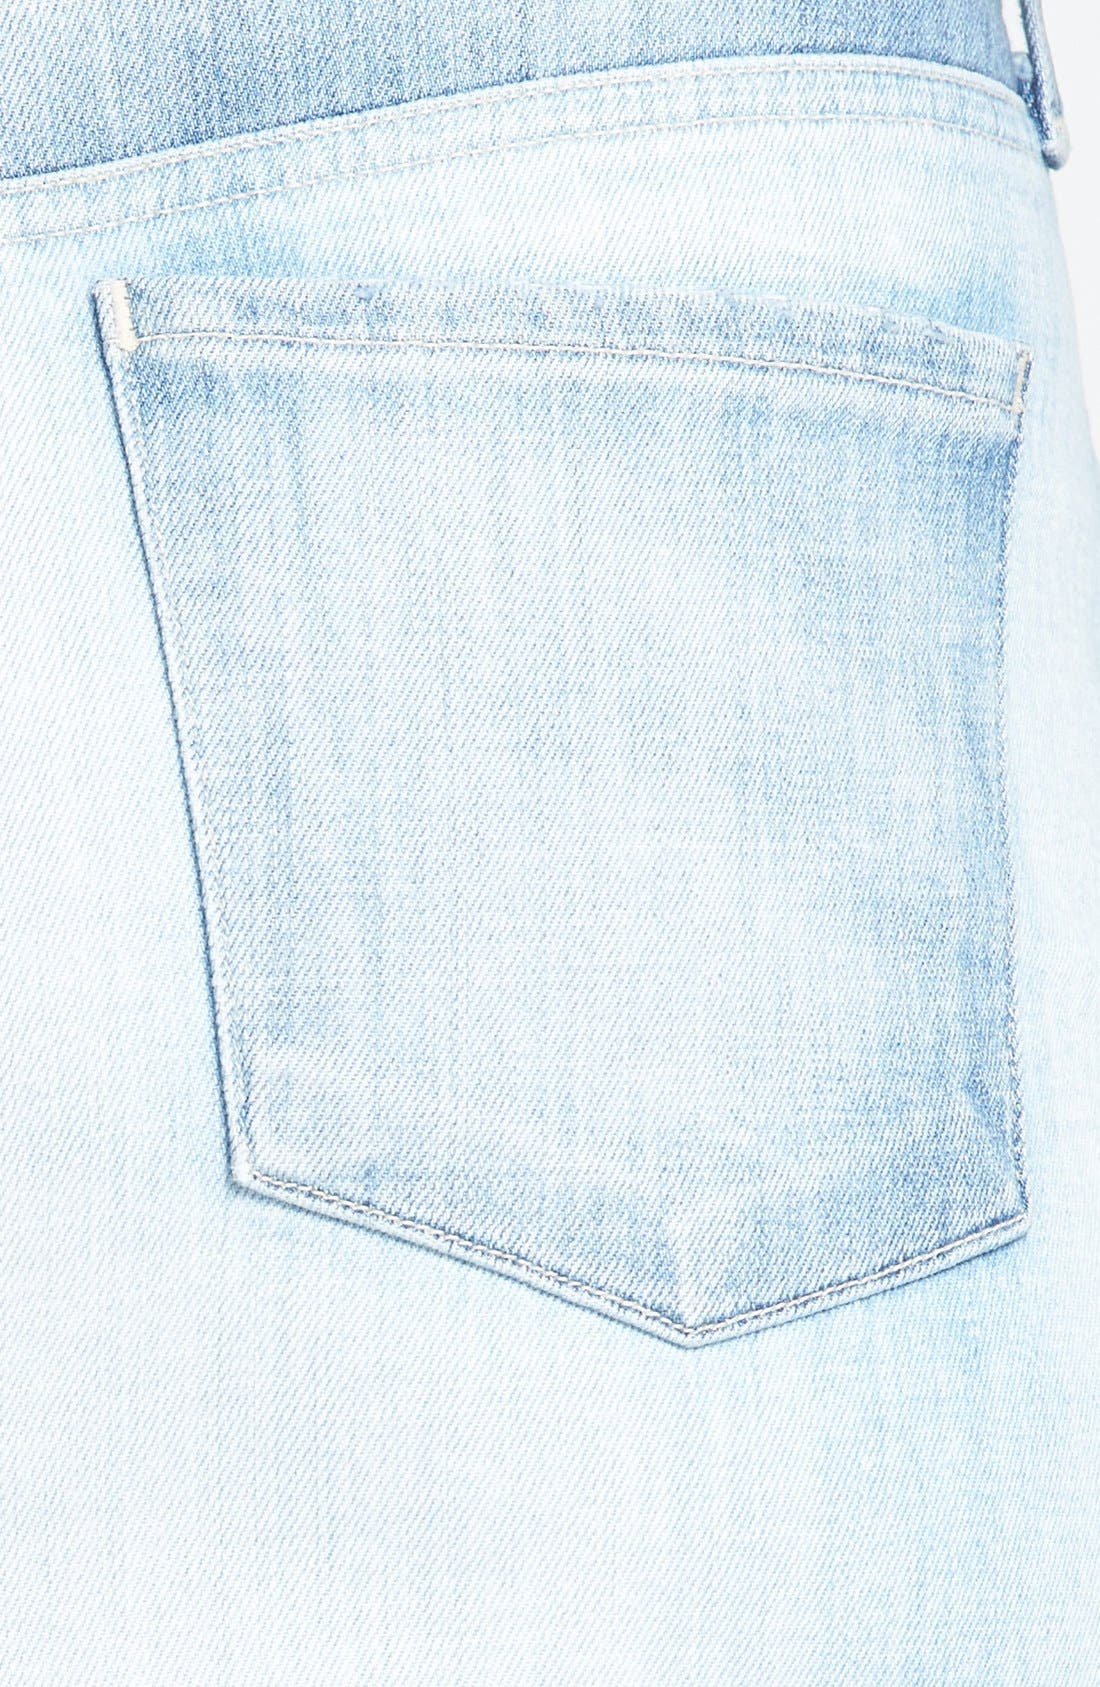 Alternate Image 3  - Citizens of Humanity 'Premium Vintage' Denim Pencil Skirt